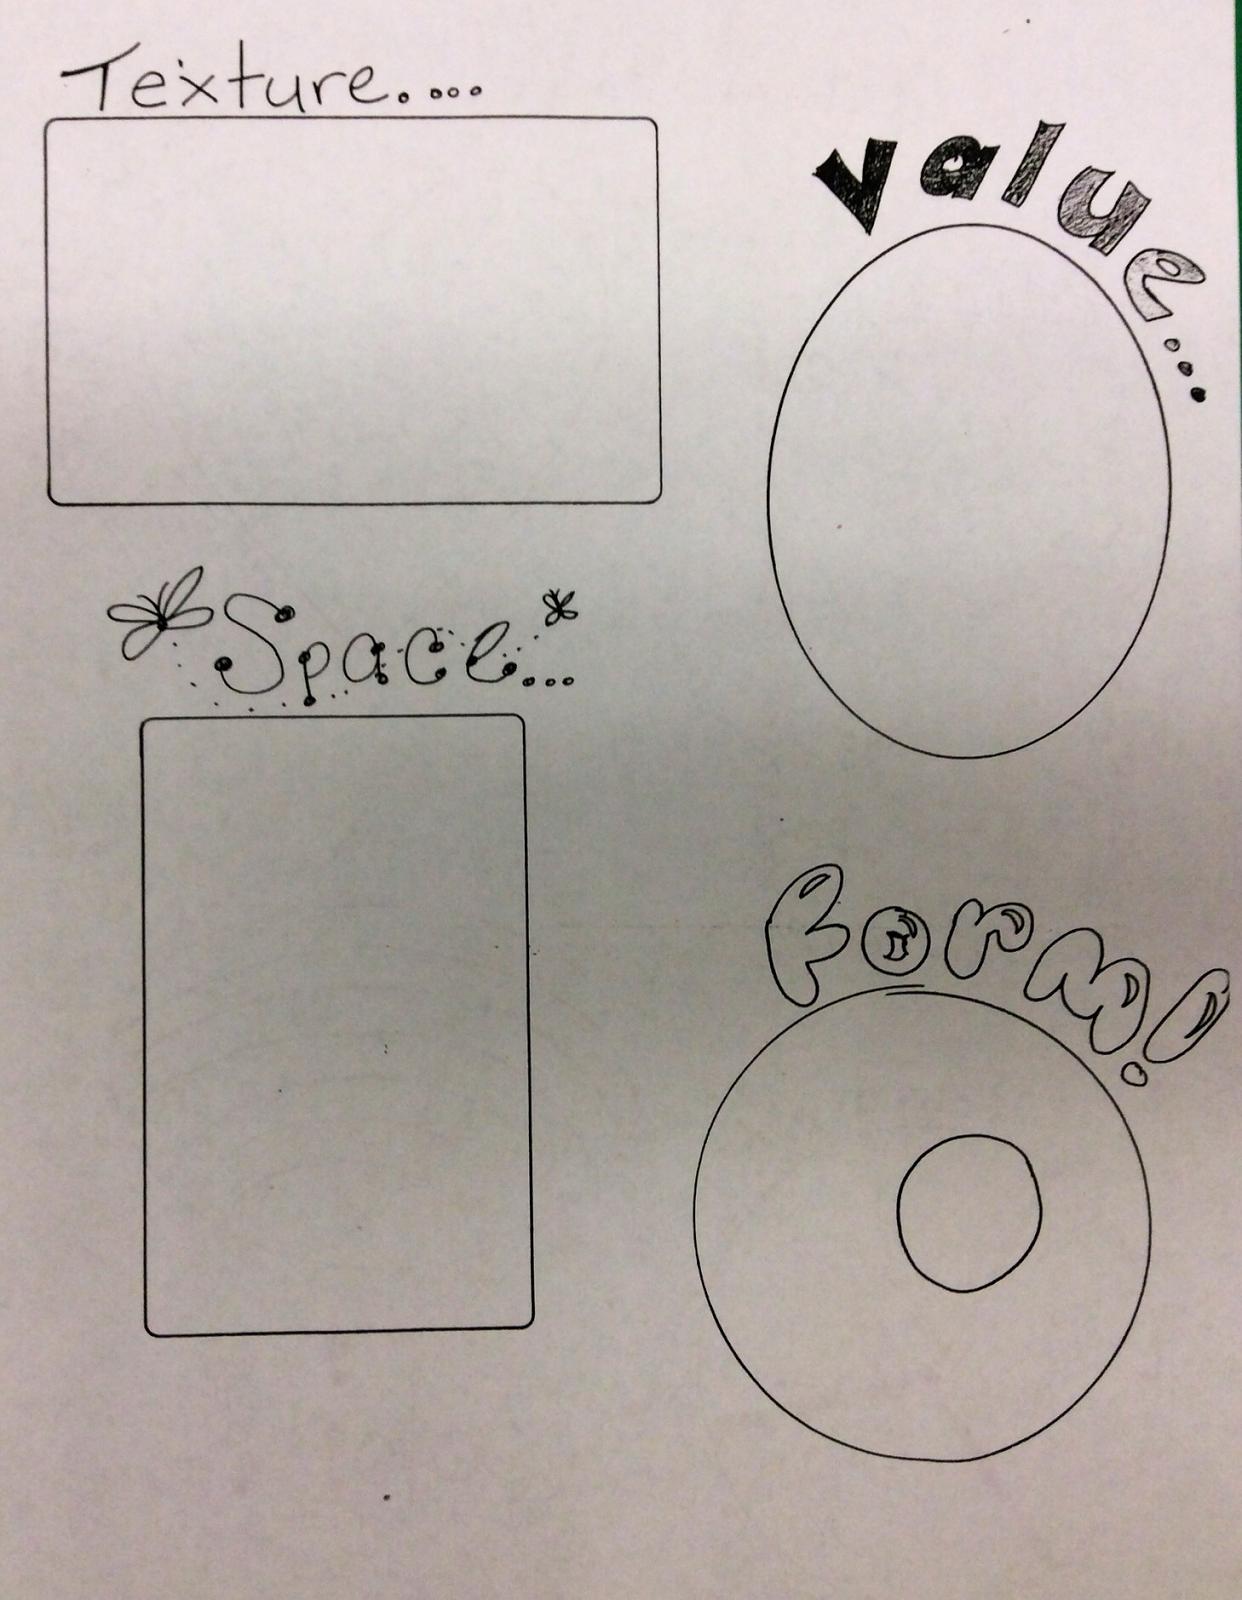 The Kreative Klassroom Elements Of Art Worksheet To